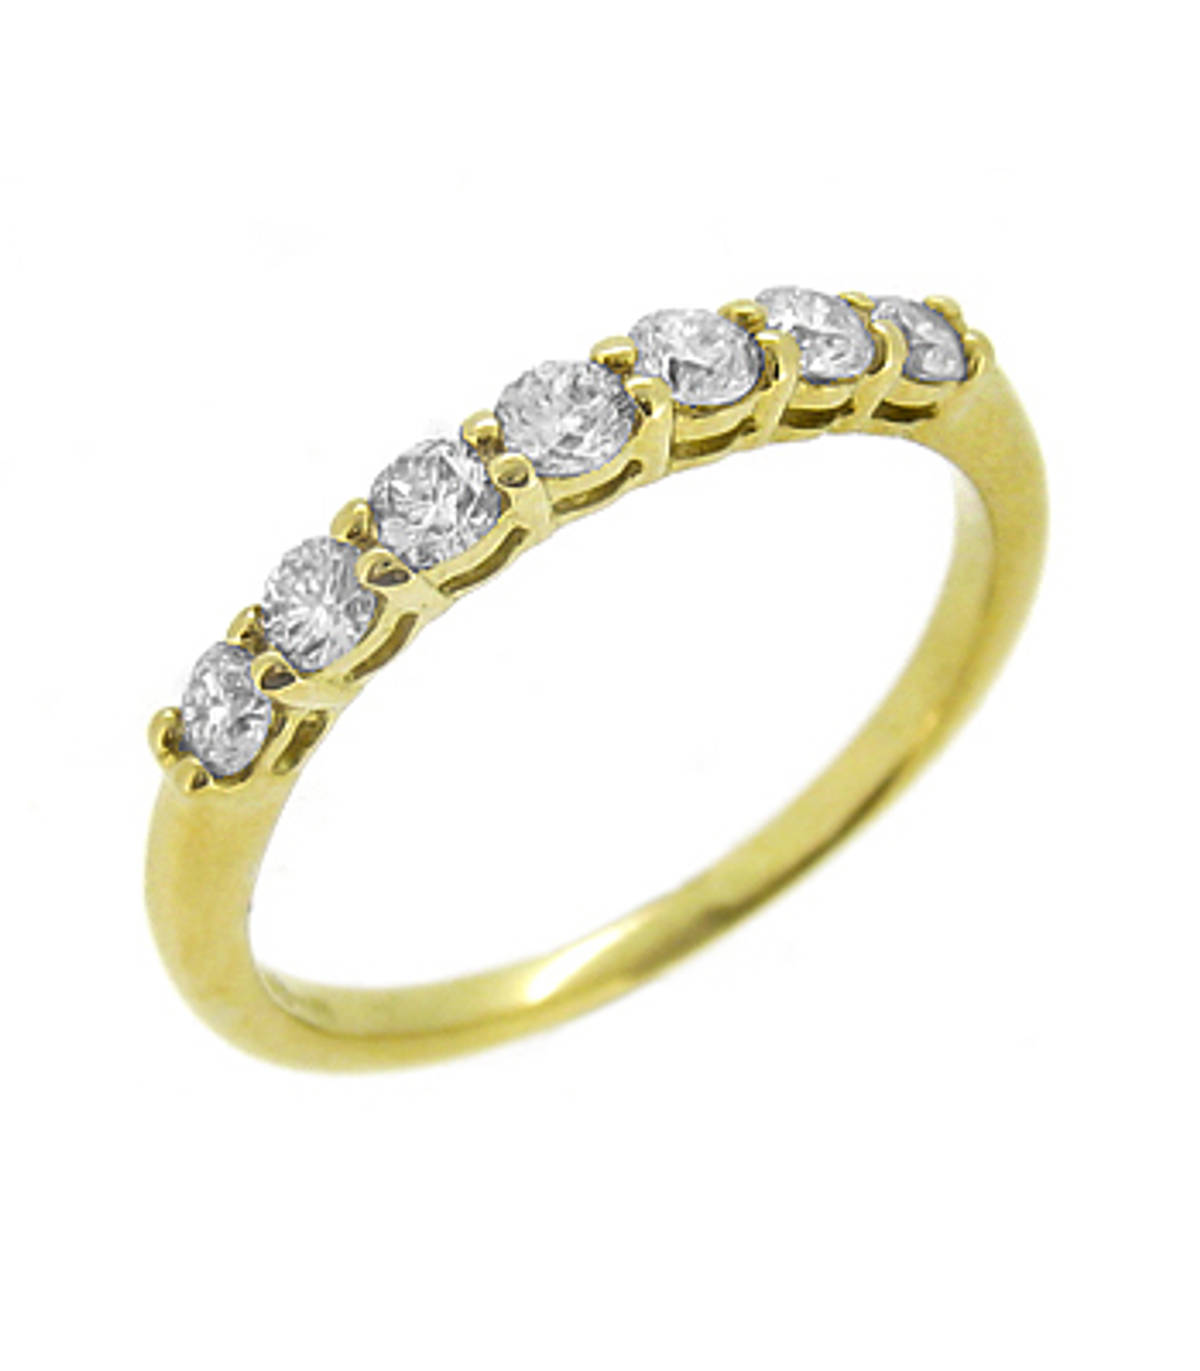 18k yellow gold 7 stone brilliant cut diamond claw set eternity ring Carat: total diamond weight 0.36cts